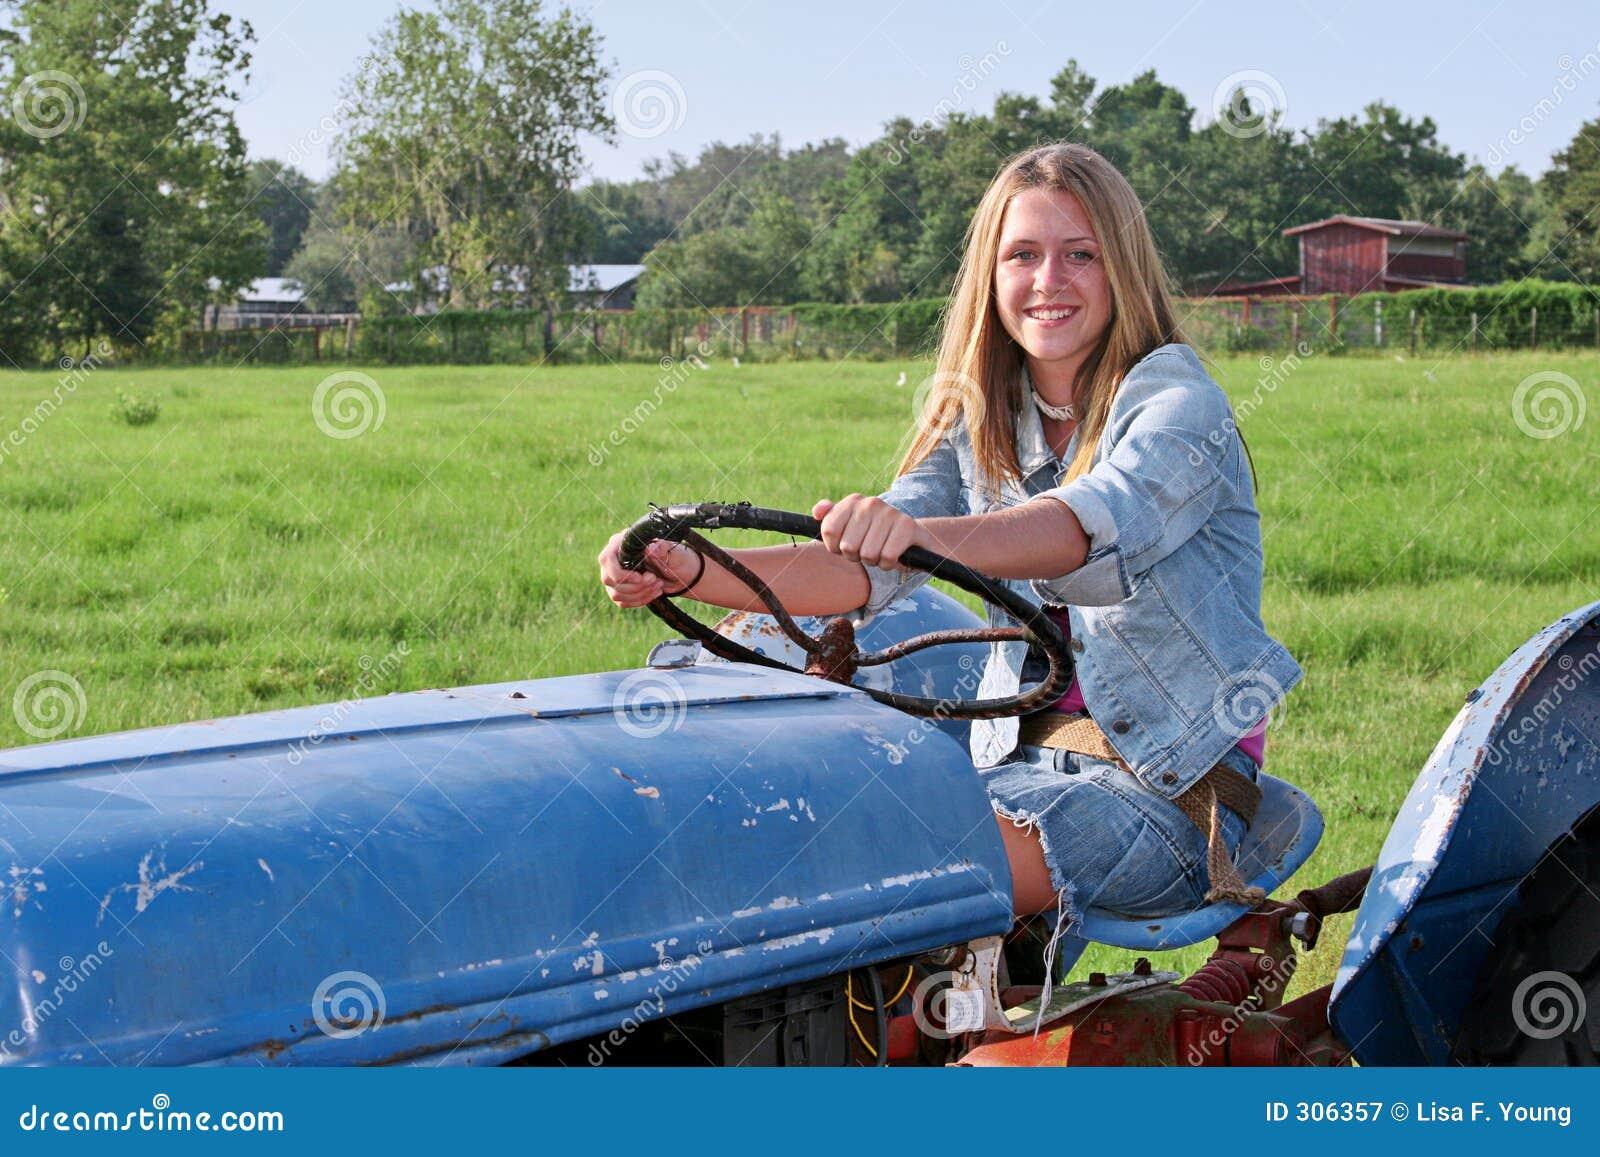 Rezultat iskanja slik za nice looking girl driving tractor